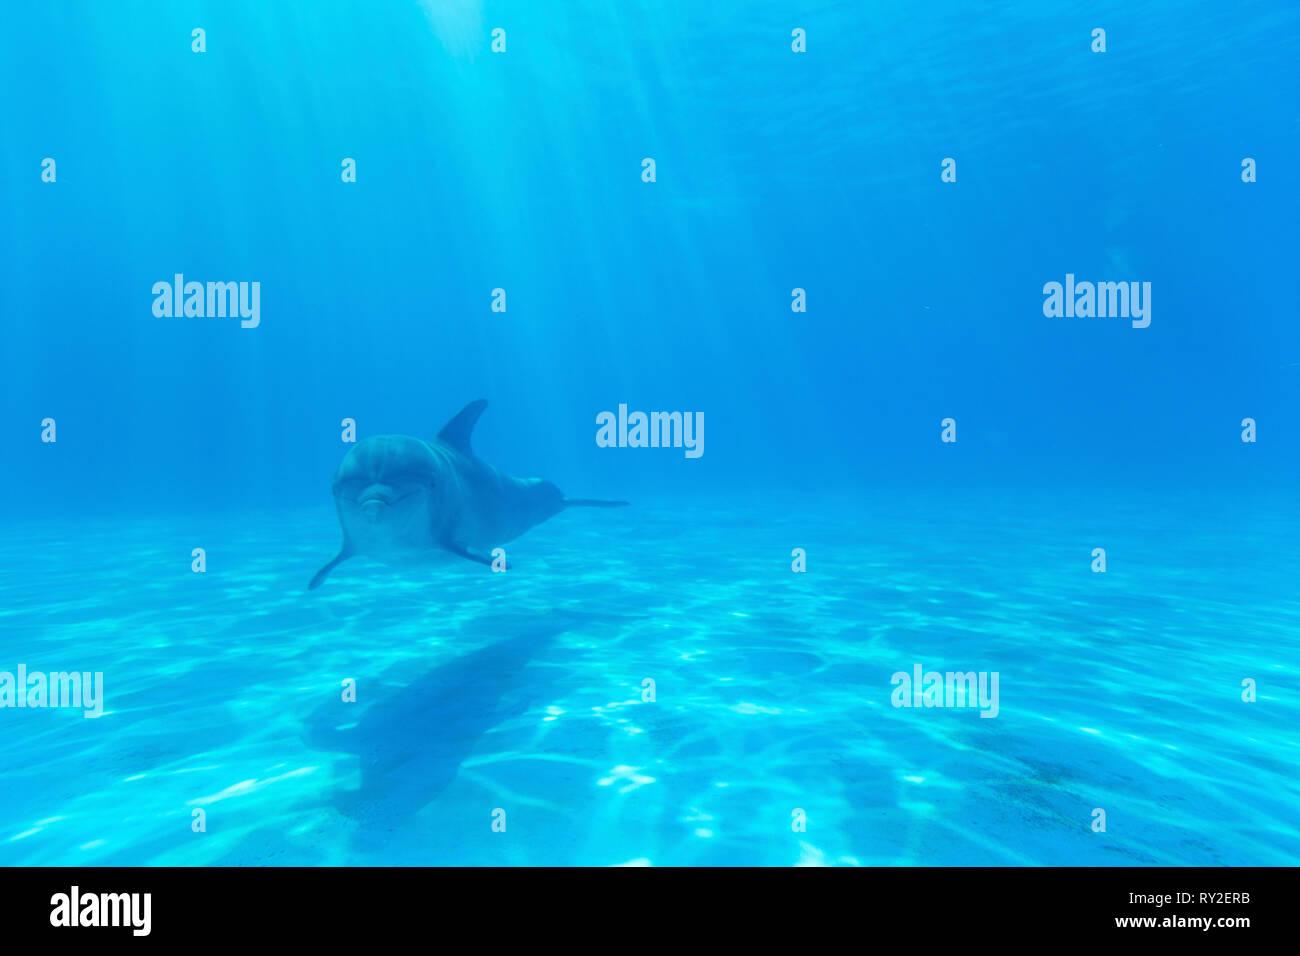 Ein Delfin im Miami Seaqueariuem bei THEMENBILD Florida, 08.02.2017 Bildnachweis: Mario Hommes / HH-Photography - Stock Image